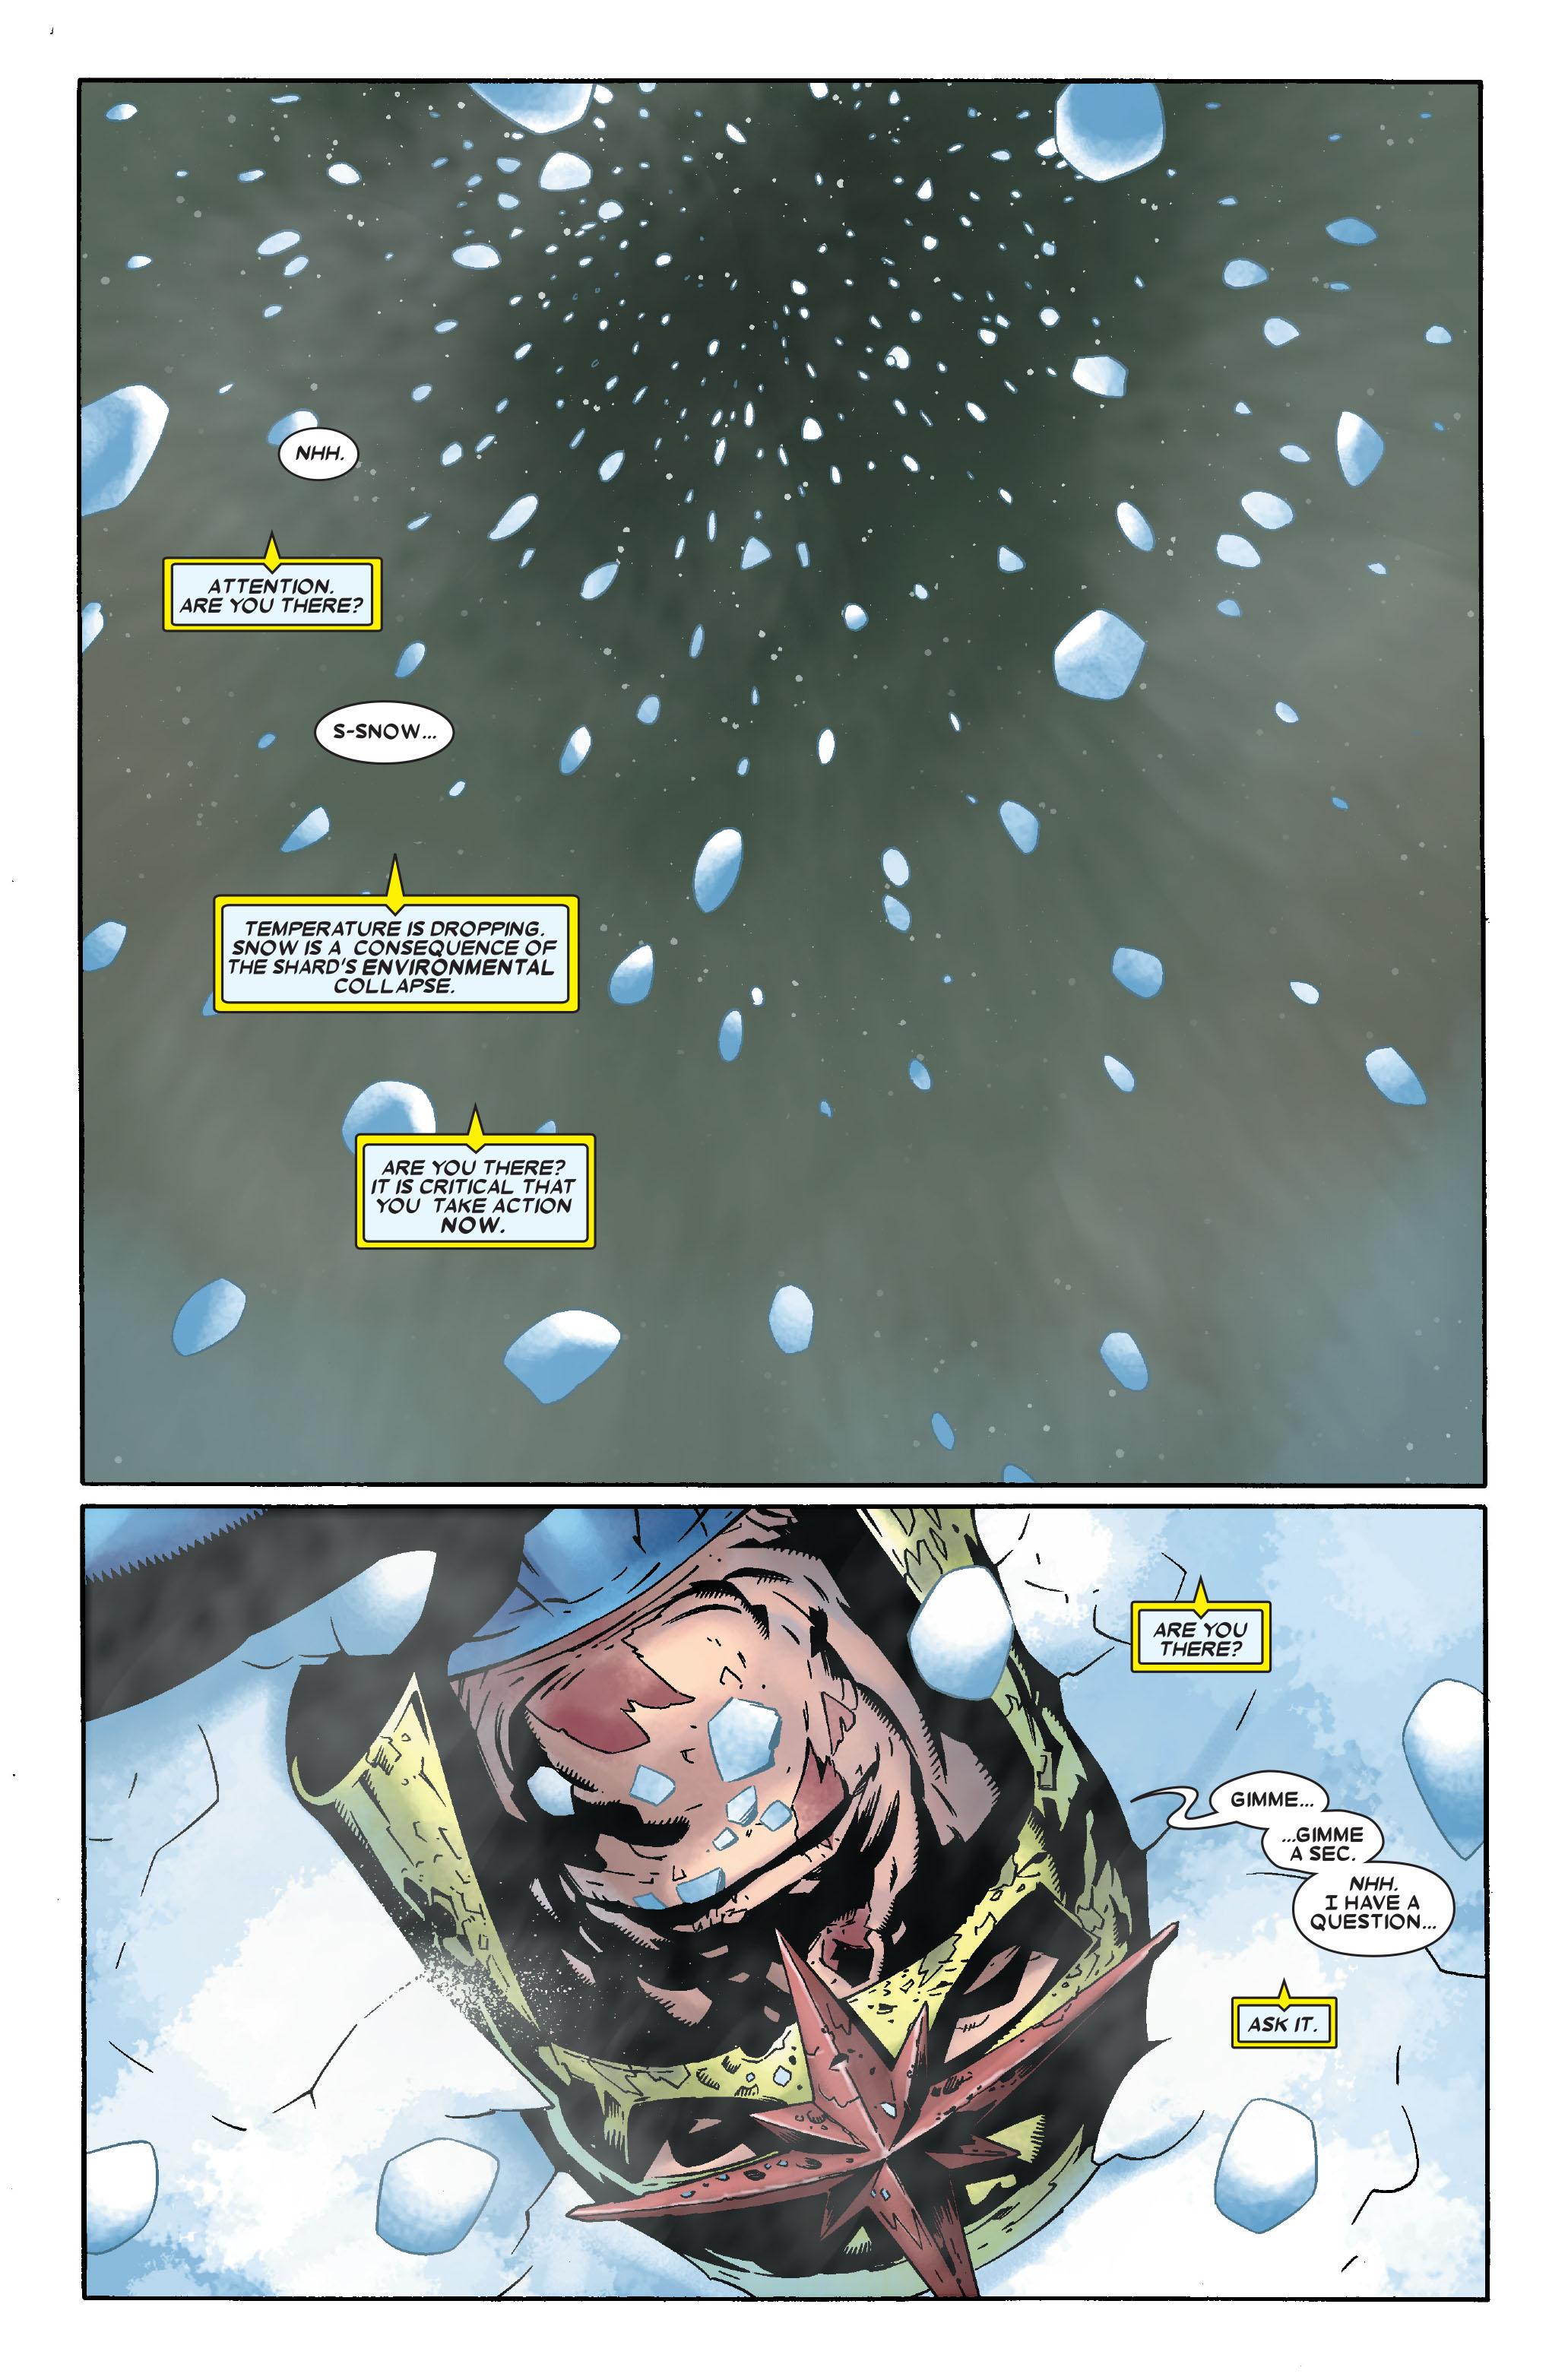 Read online Annihilation: Nova comic -  Issue #1 - 4